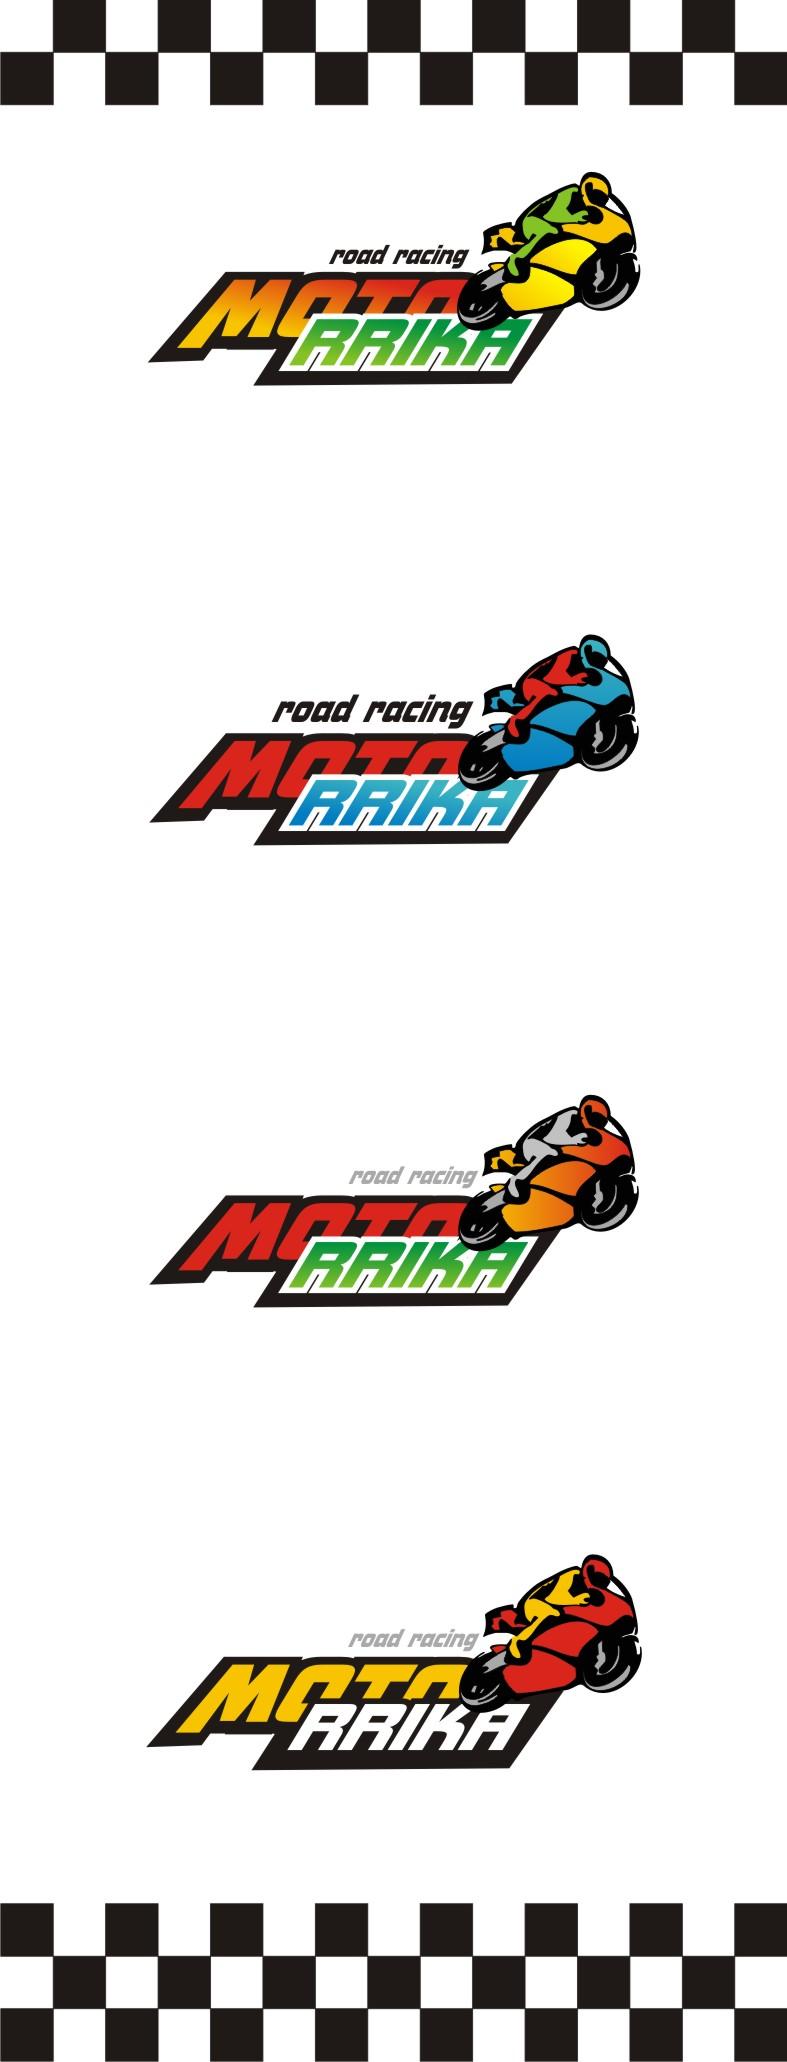 Мотогонки. Логотип, фирменный стиль. фото f_4dd50d421a797.jpg